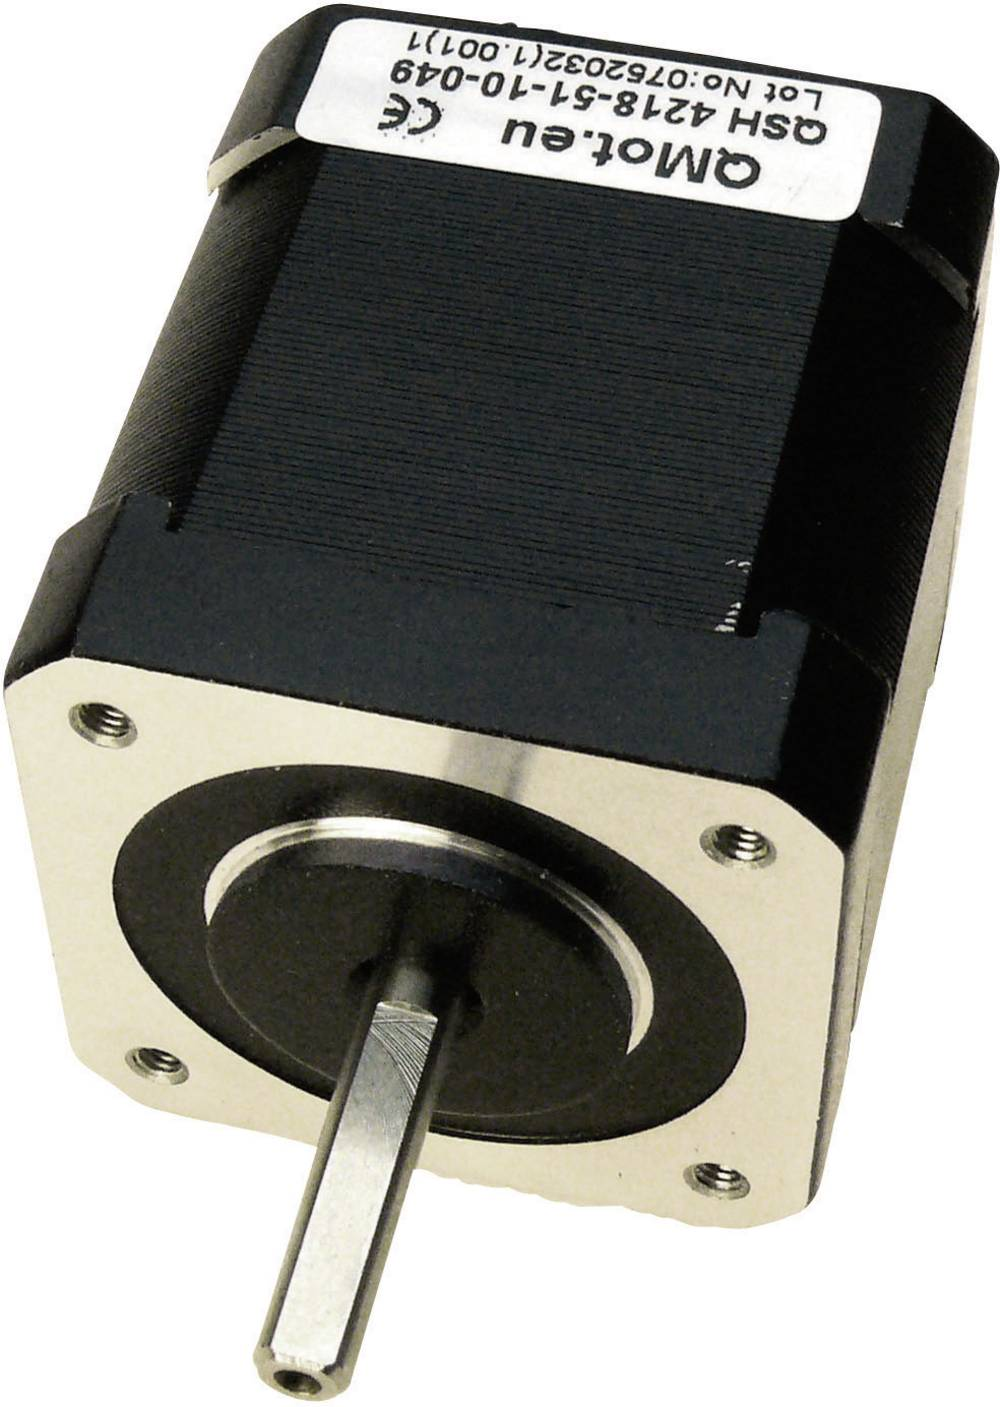 Trinamic QSH4218-35-10-0270-Koračno/Hibridni motor QMot 1,8° 40 V/DC, 0.27 Nm, (max.) 1 A